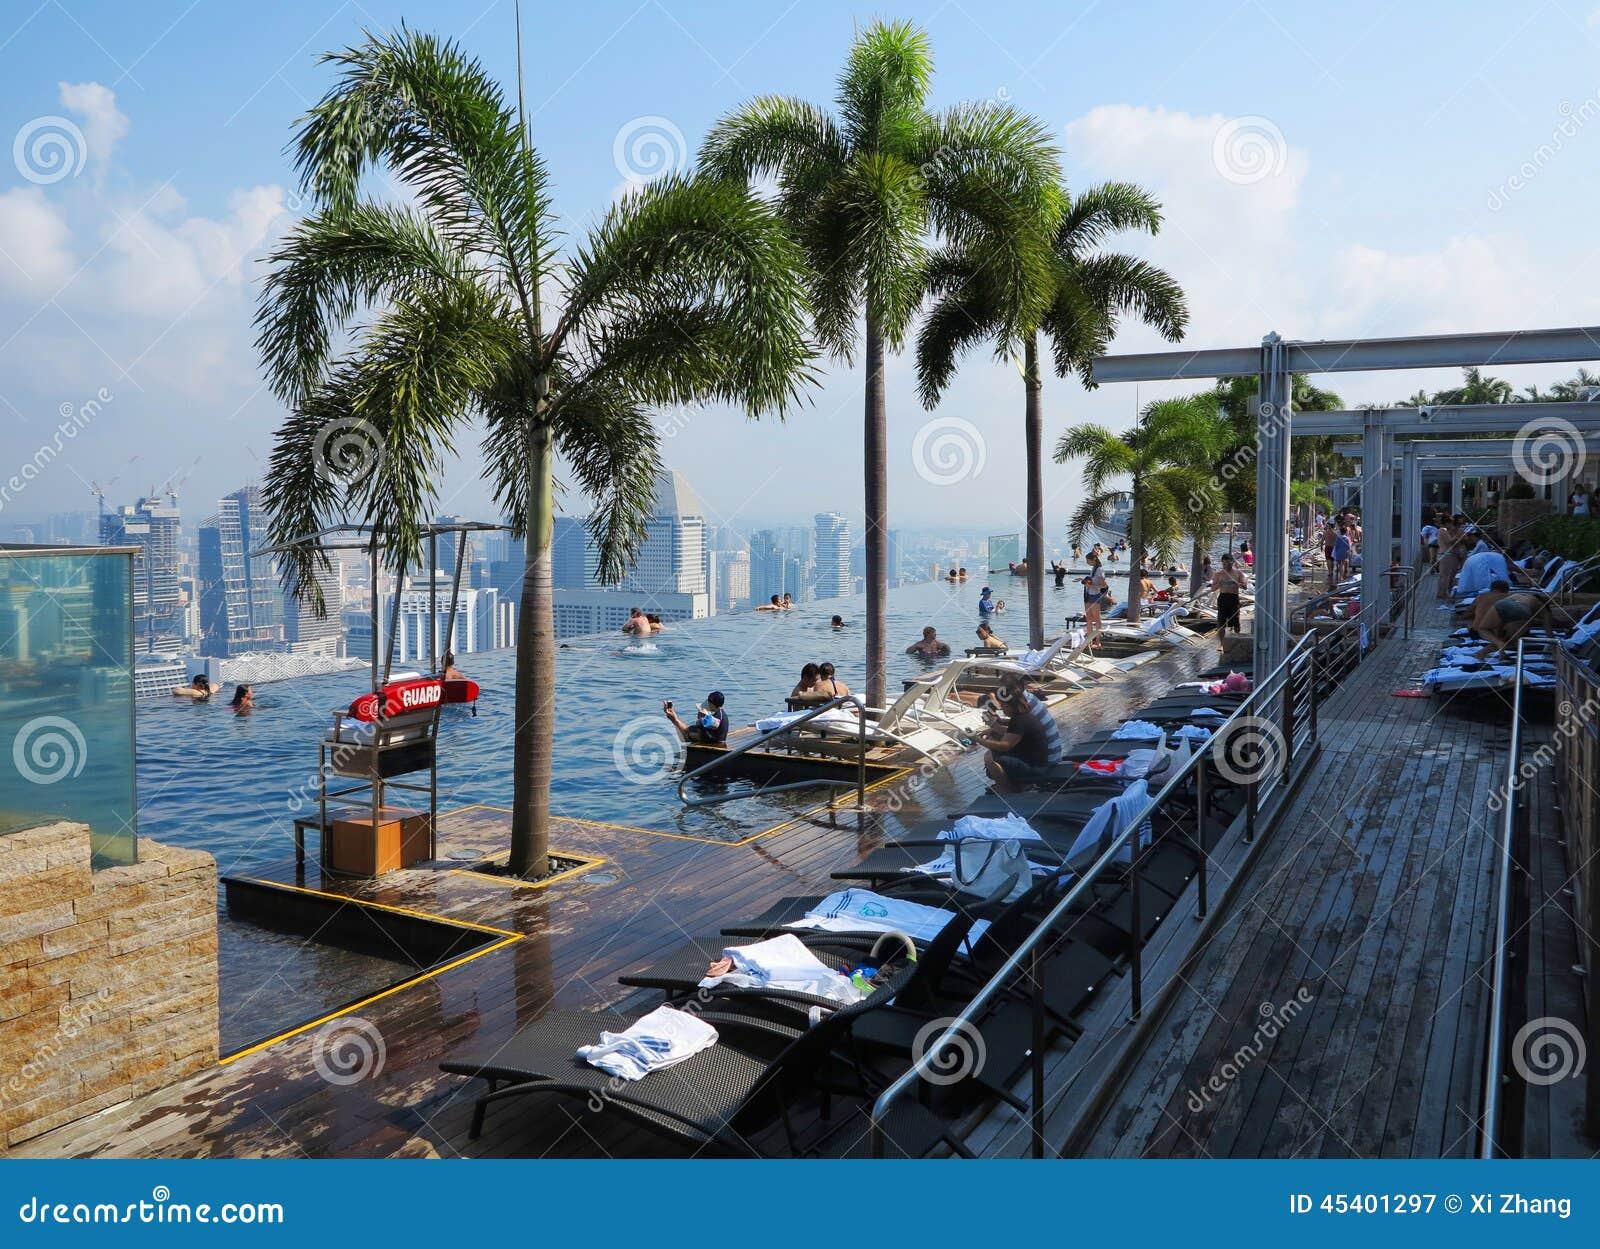 Piscine de singapour marina bay sands hotel swimming photographie ditorial image du marina - Ingresso piscina marina bay sands ...